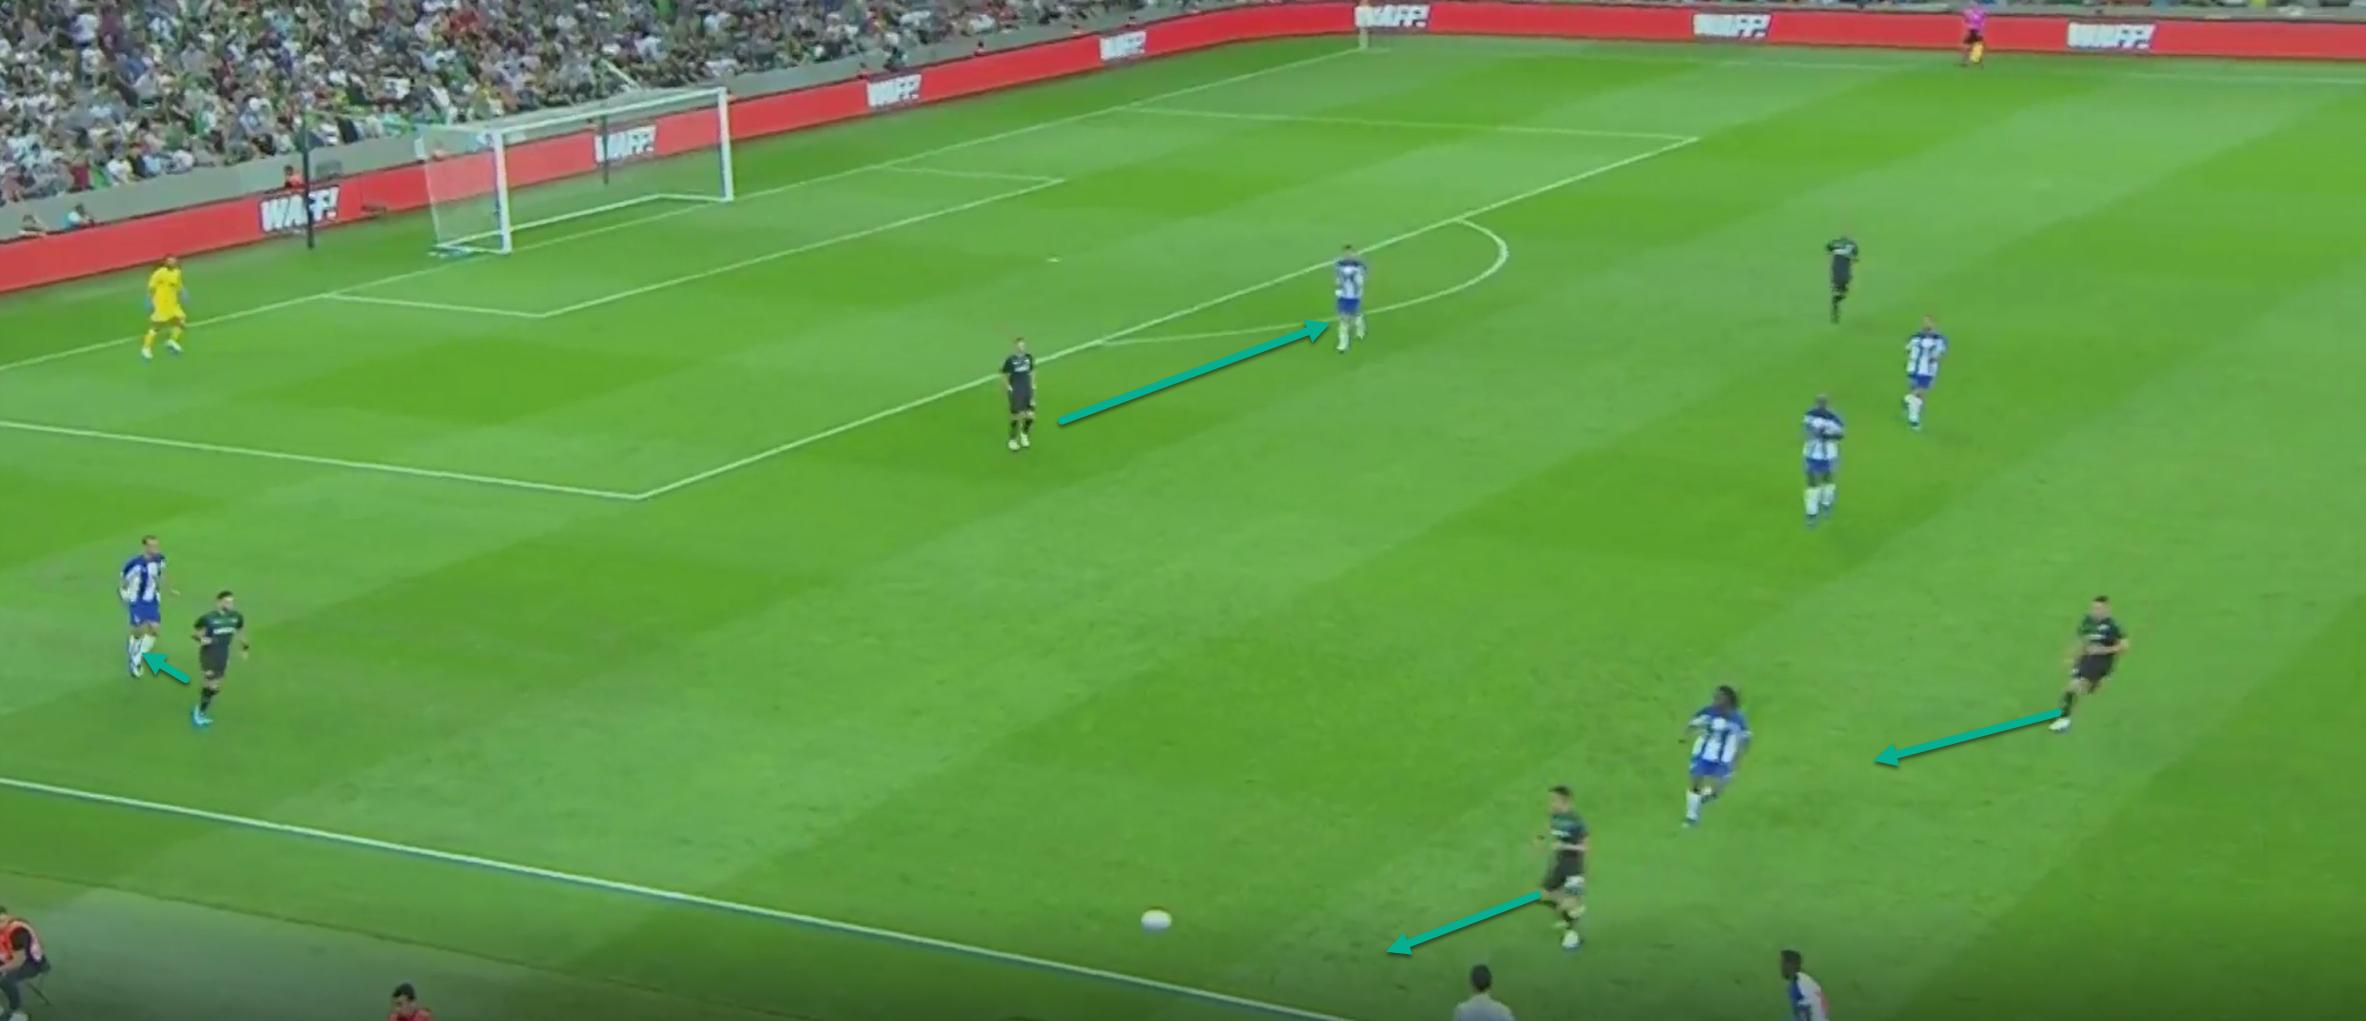 UEFA Champions League qualifiers: Krasnodar vs Porto- Tactical Analysis tactics